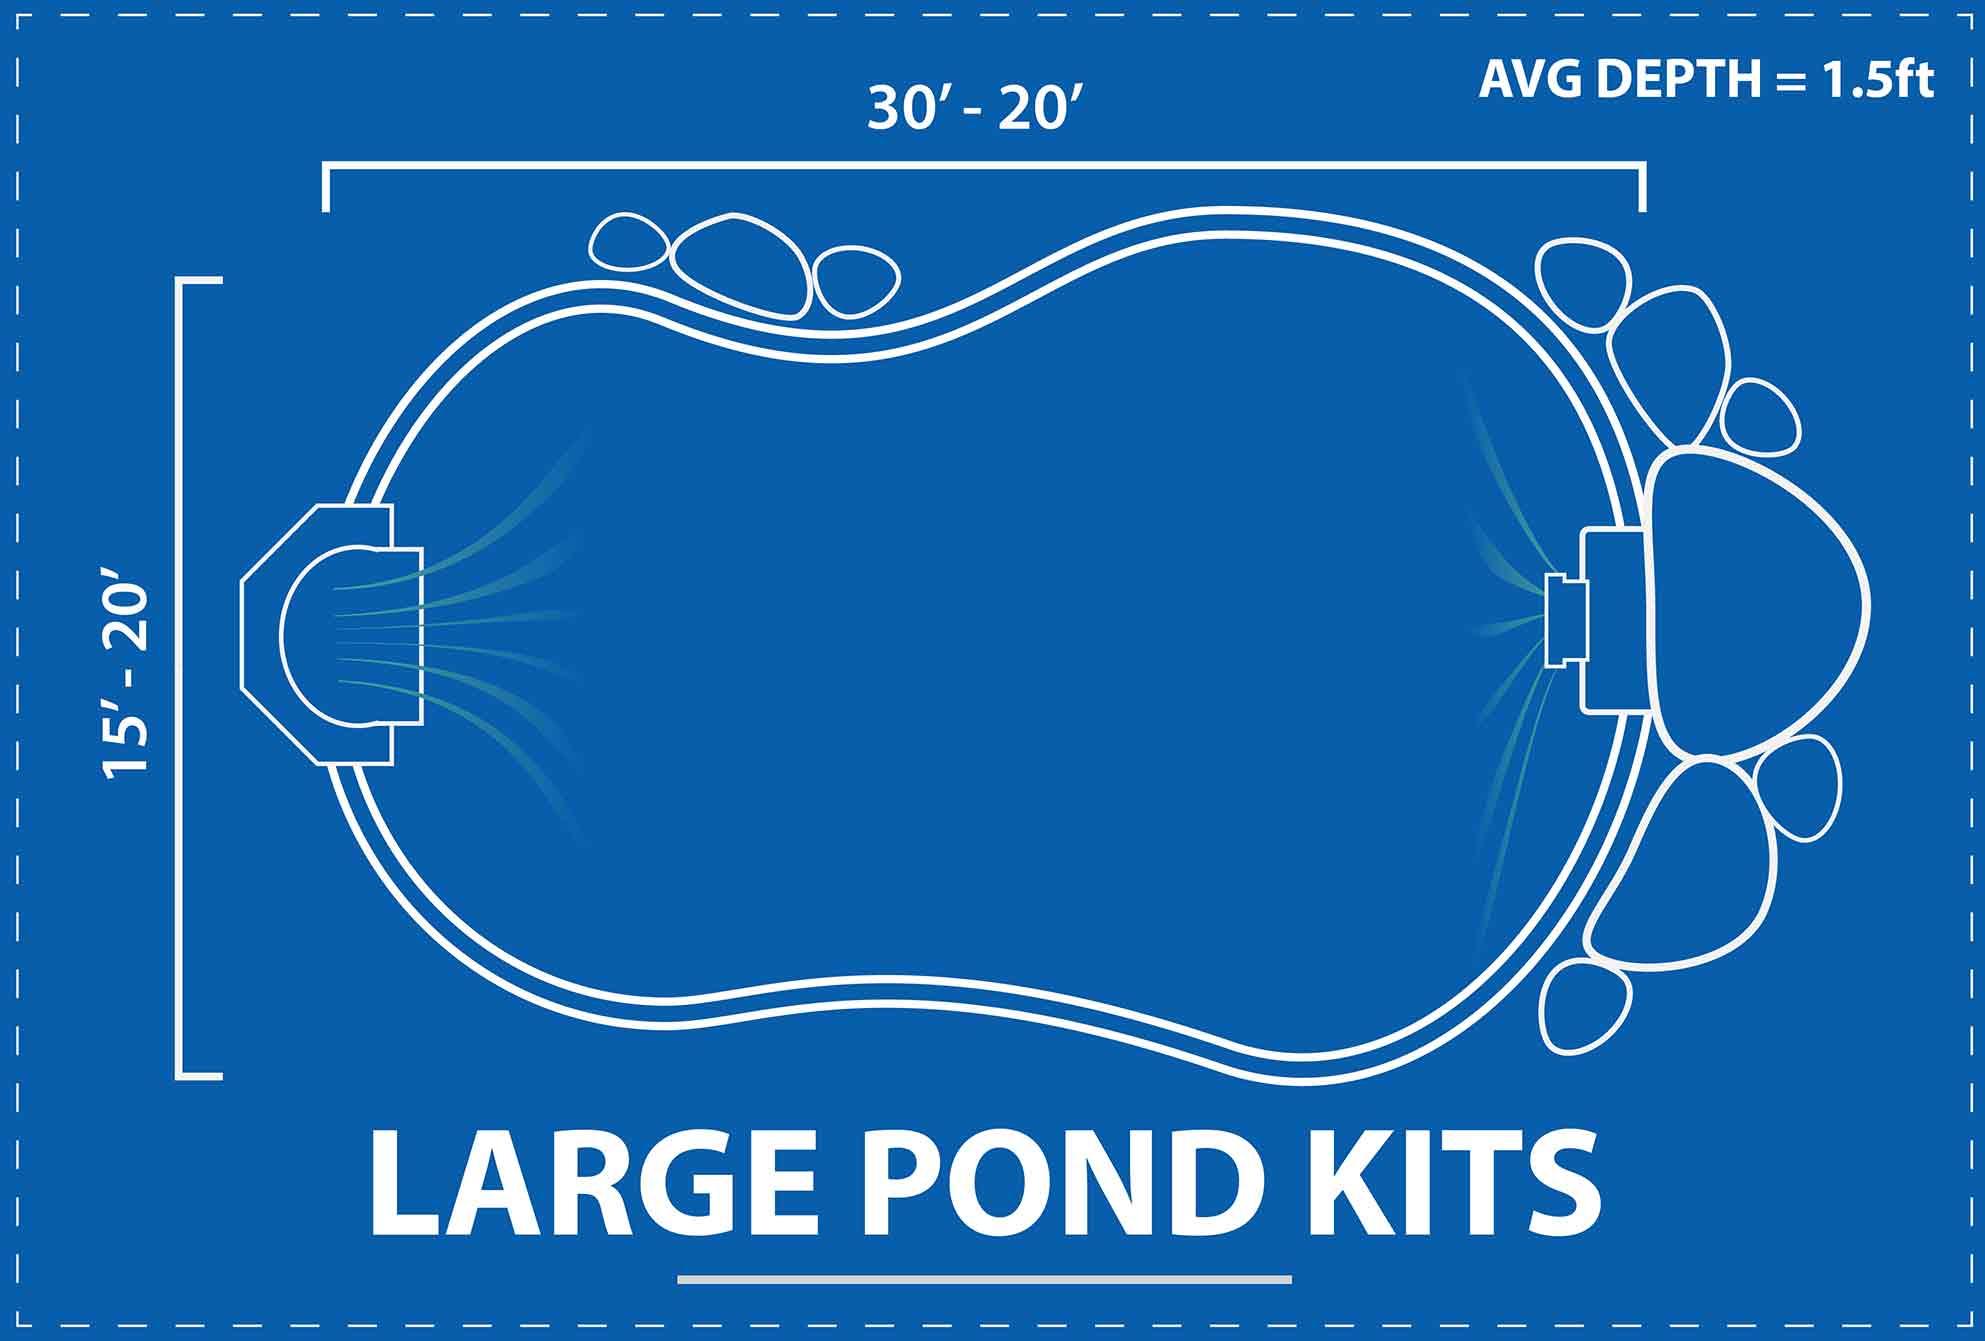 Large Pond Kits